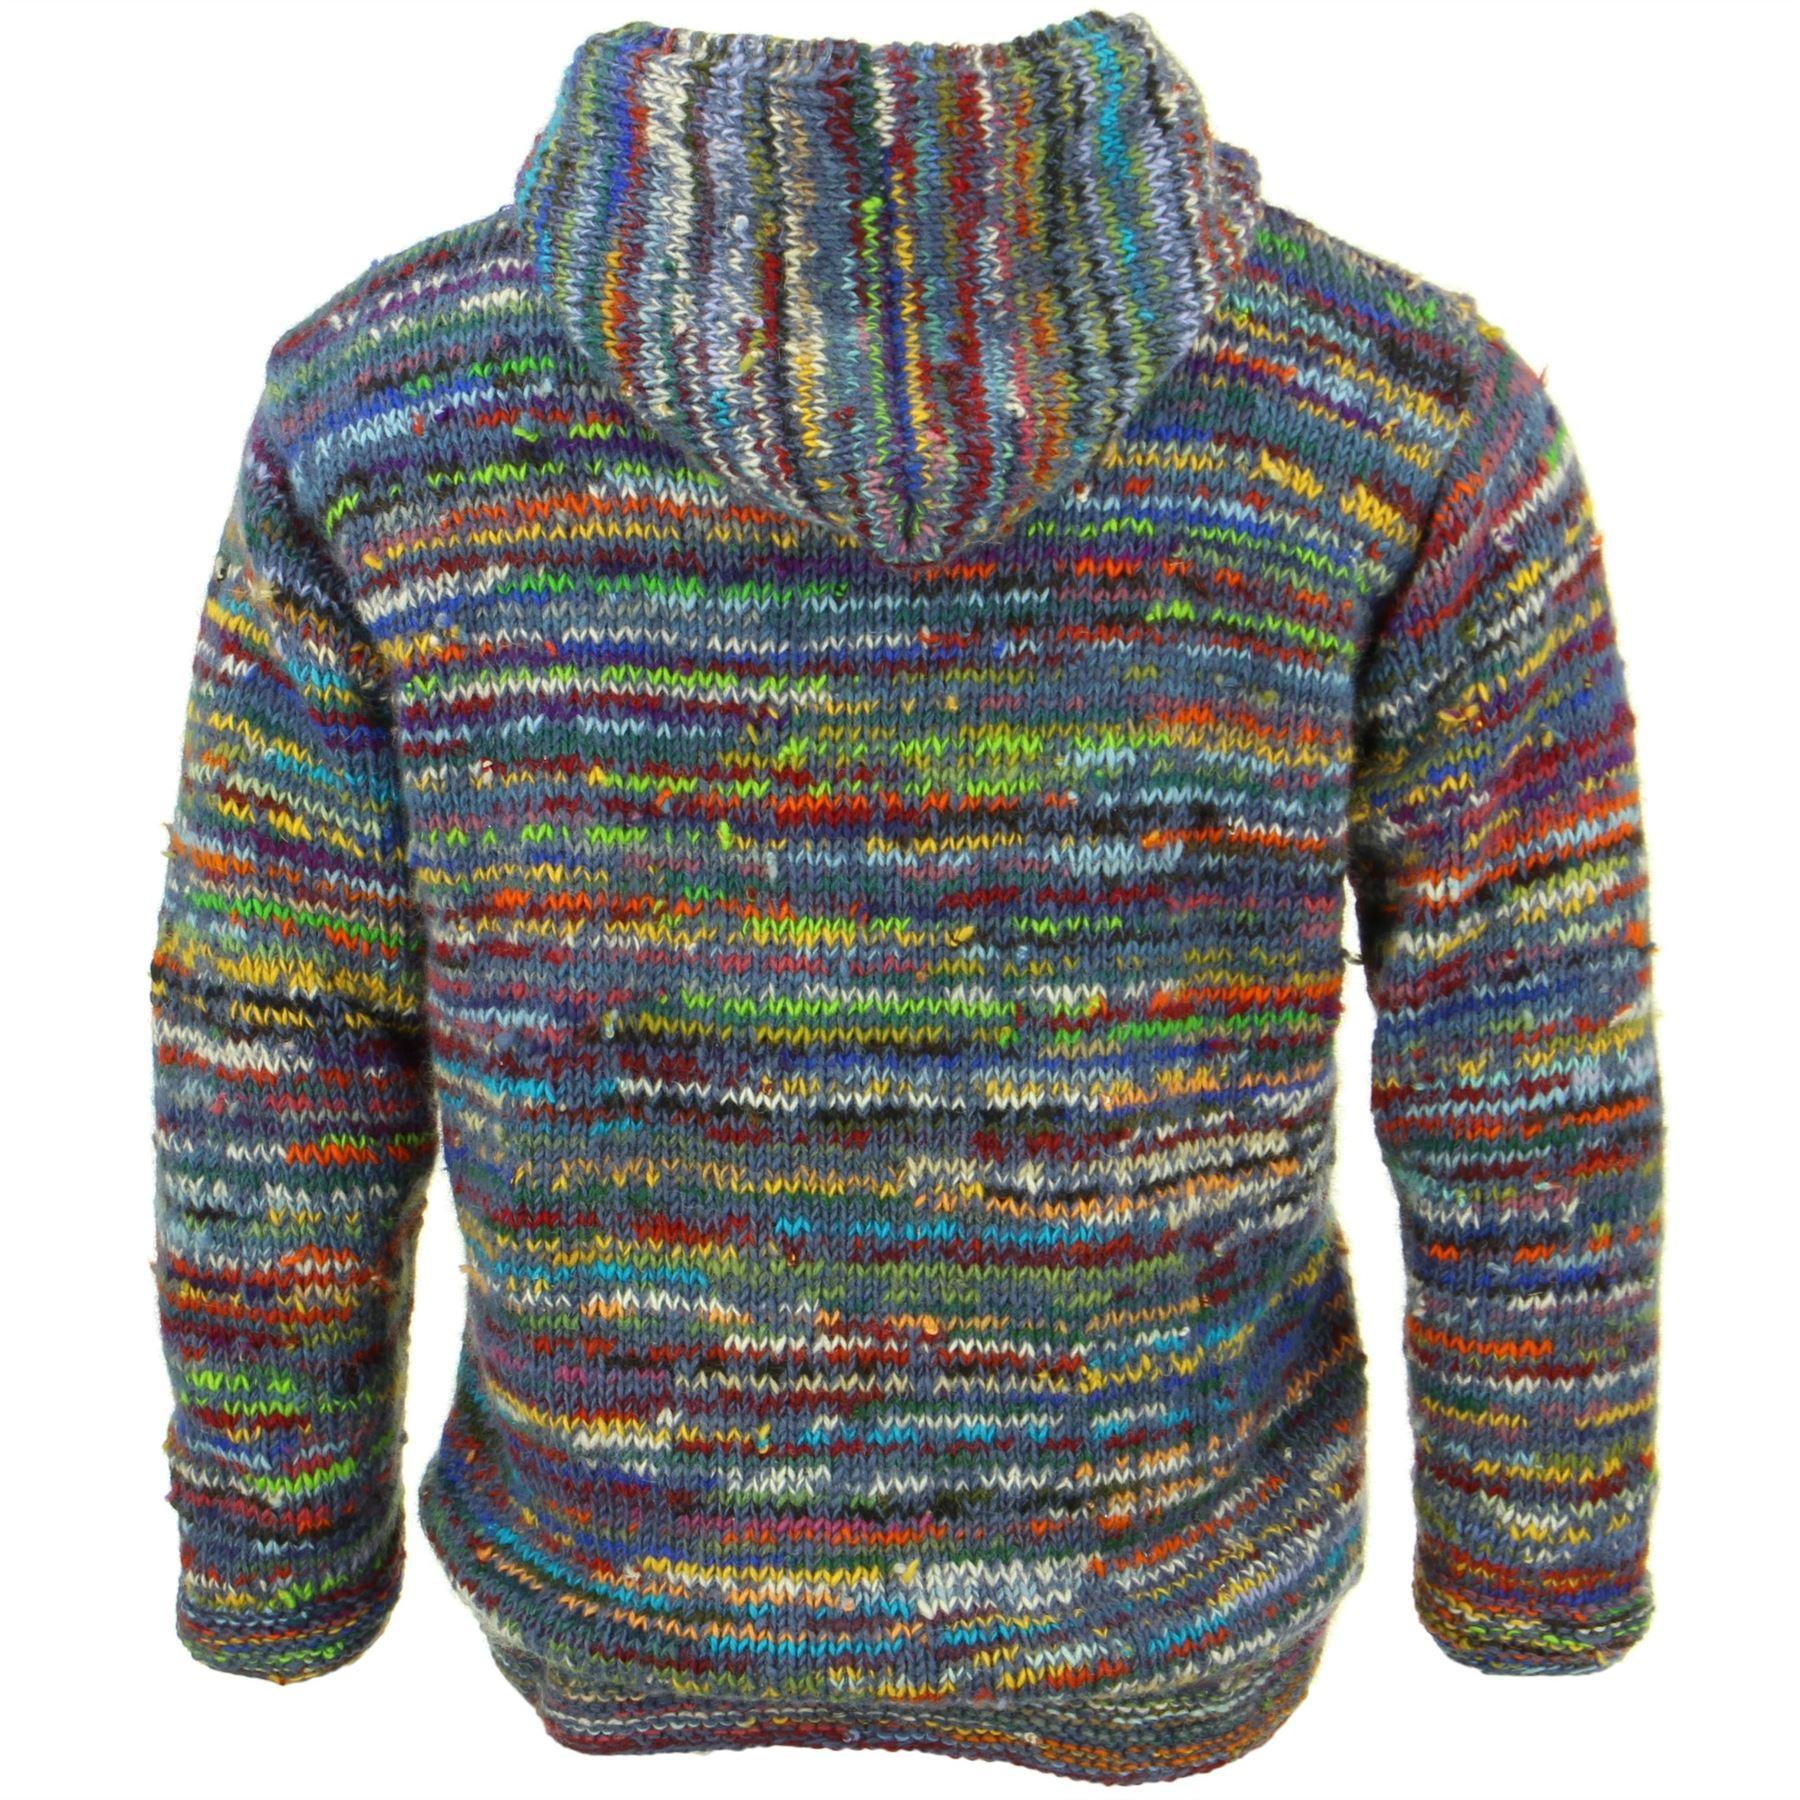 Hoodie Jumper LoudElephant Hoody SPACE DYE COLOURS Cardigan Jacket Fleece Zipped